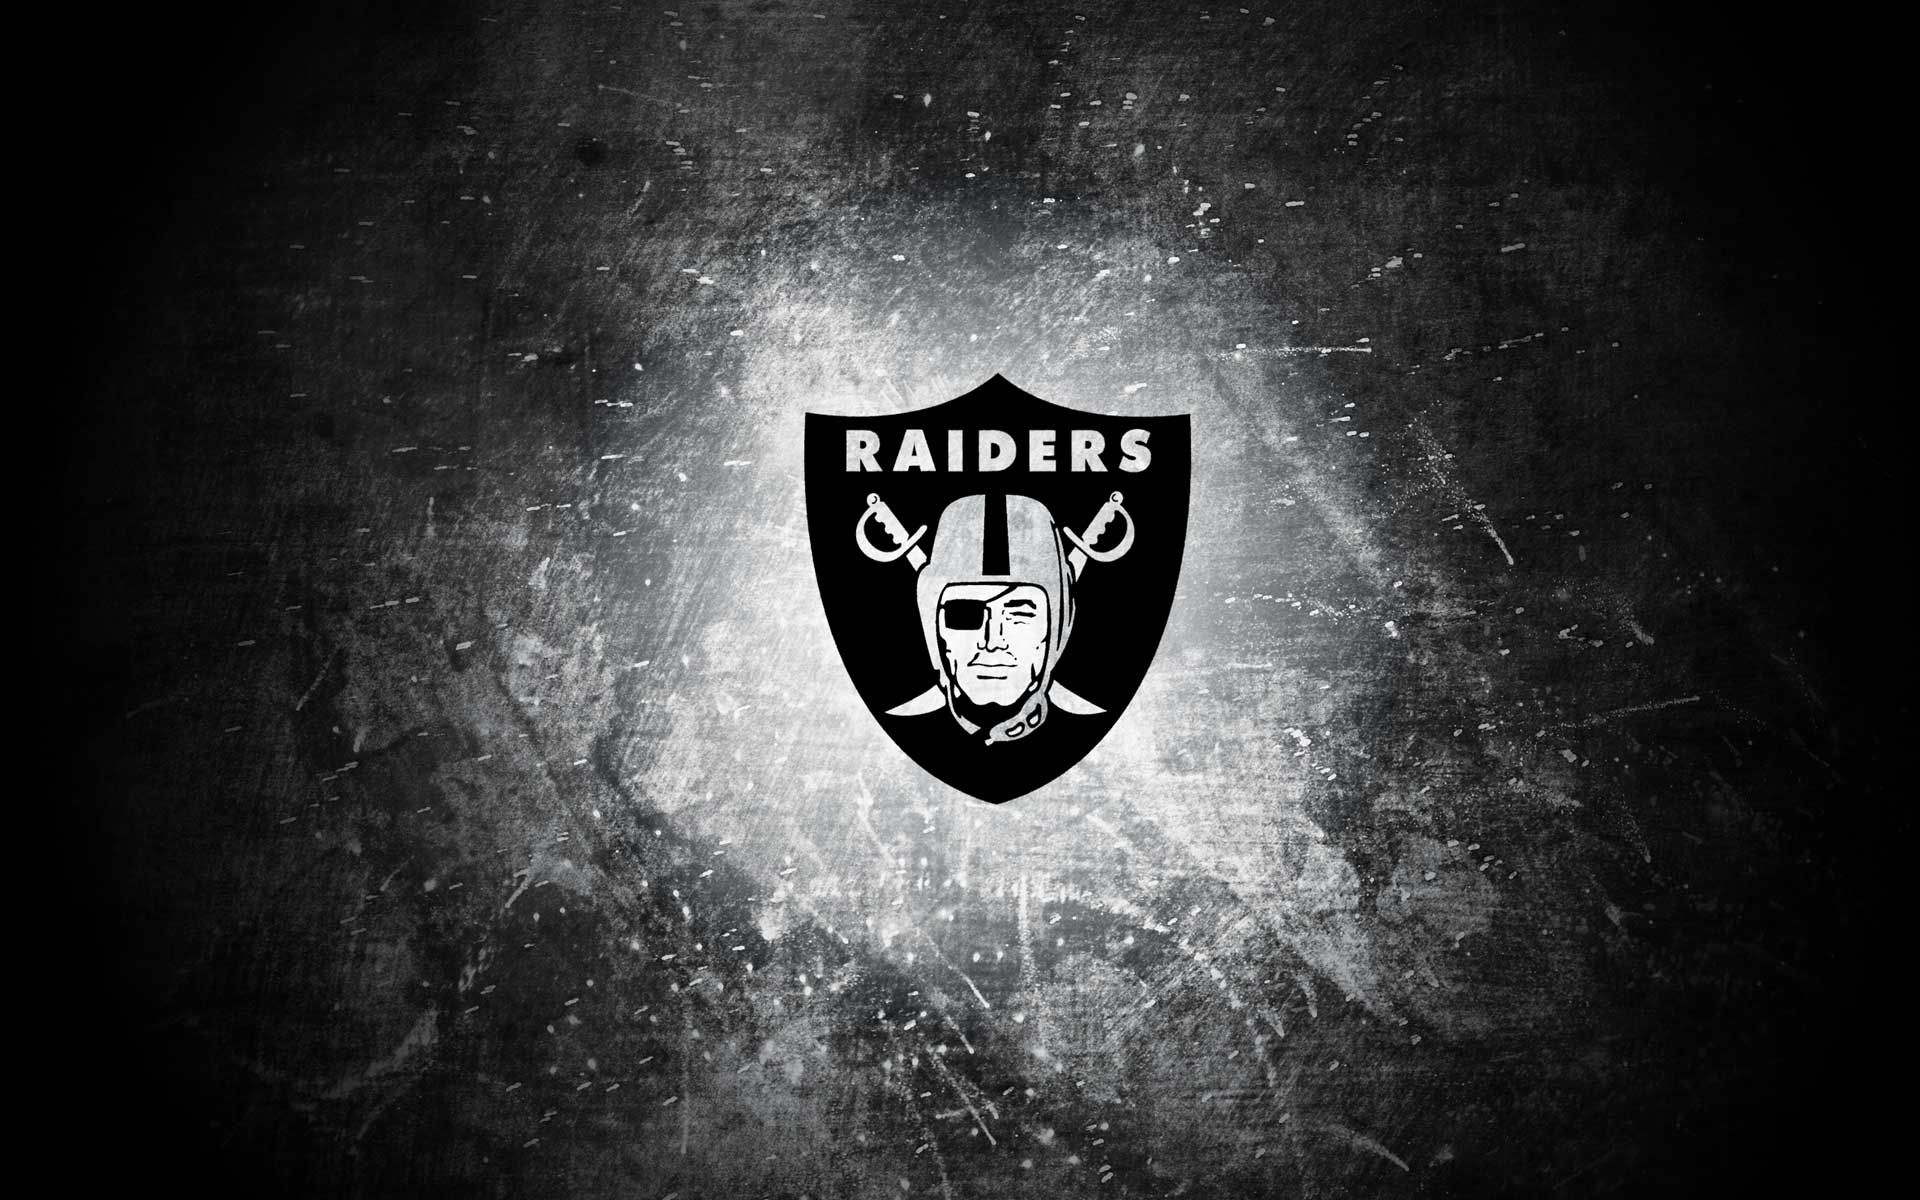 Oakland Raiders Nfl Oakland raiders logo, Oakland